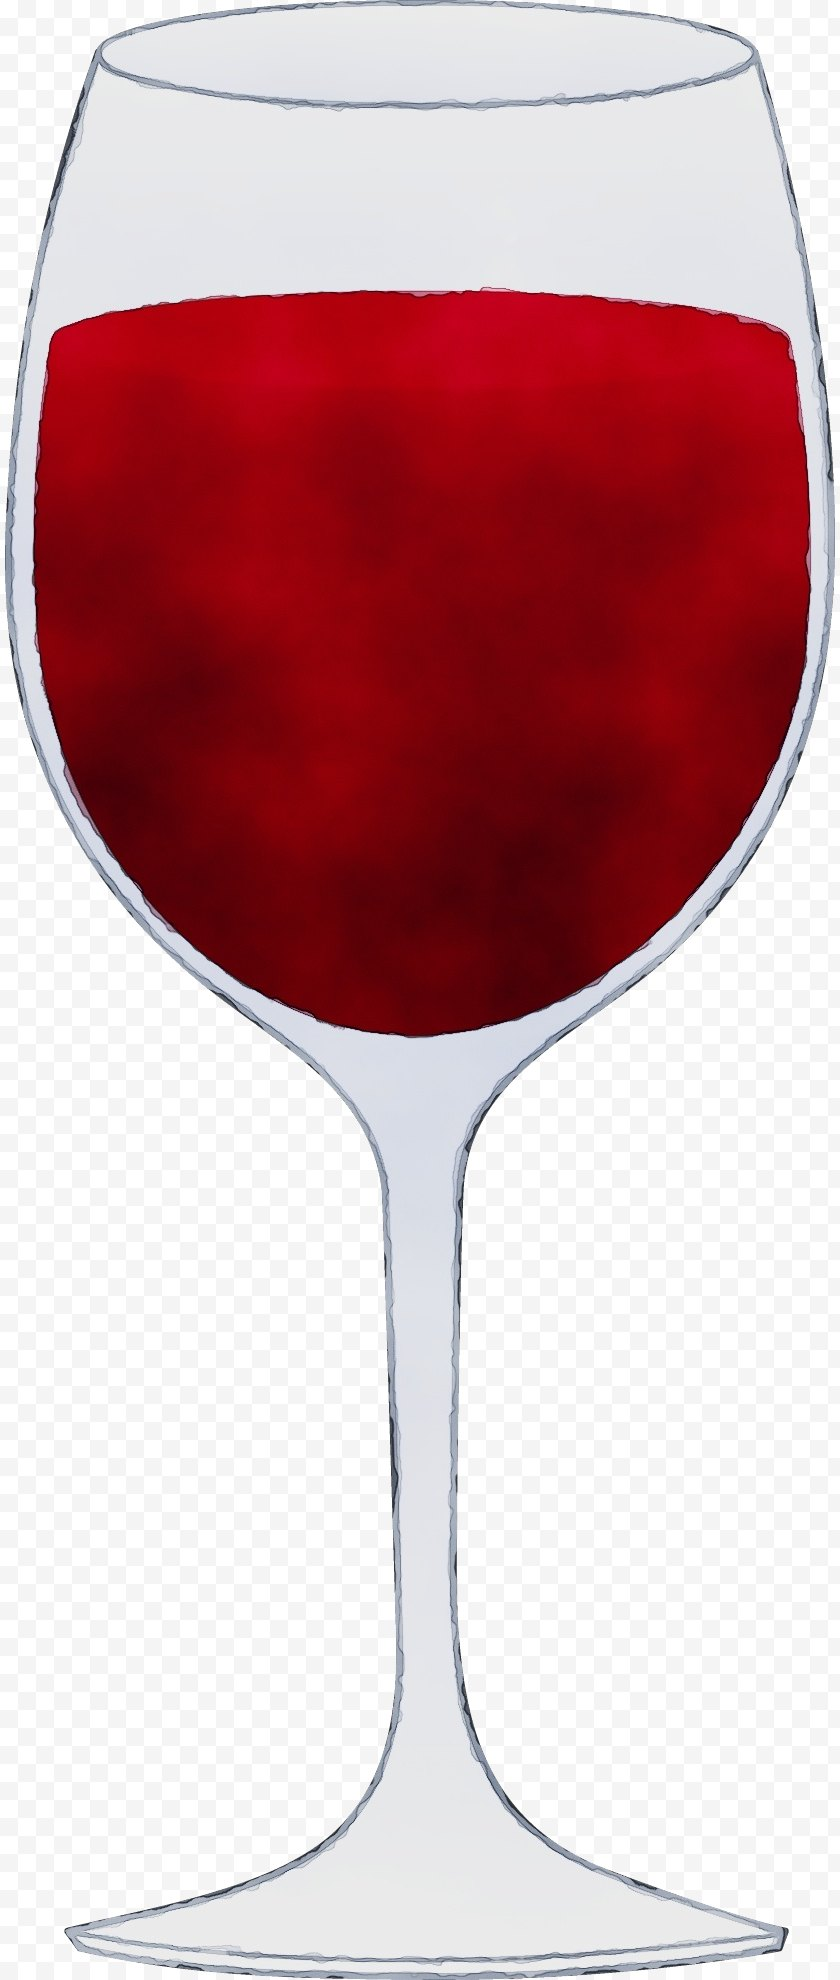 Drink - Wine Glass - Manhattan Tableware Free PNG